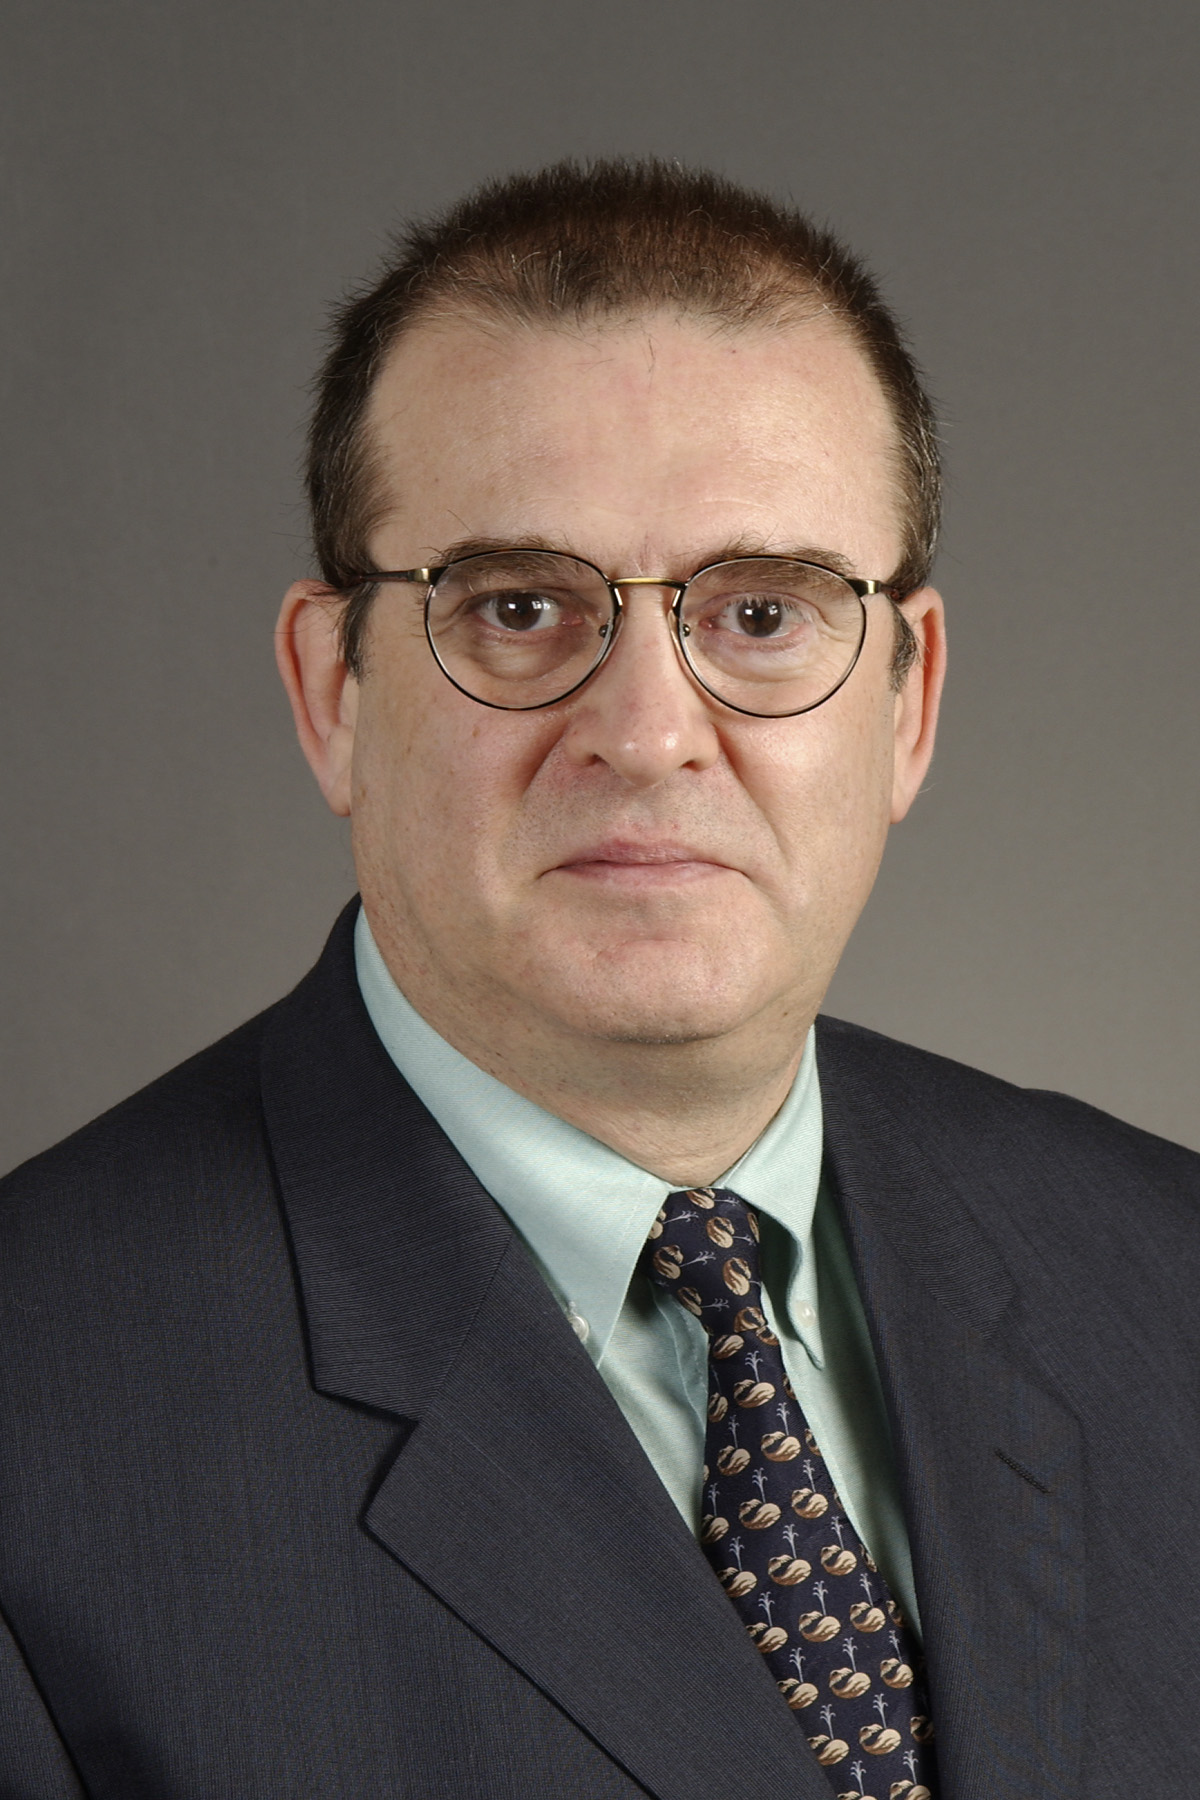 Gregory Dembo